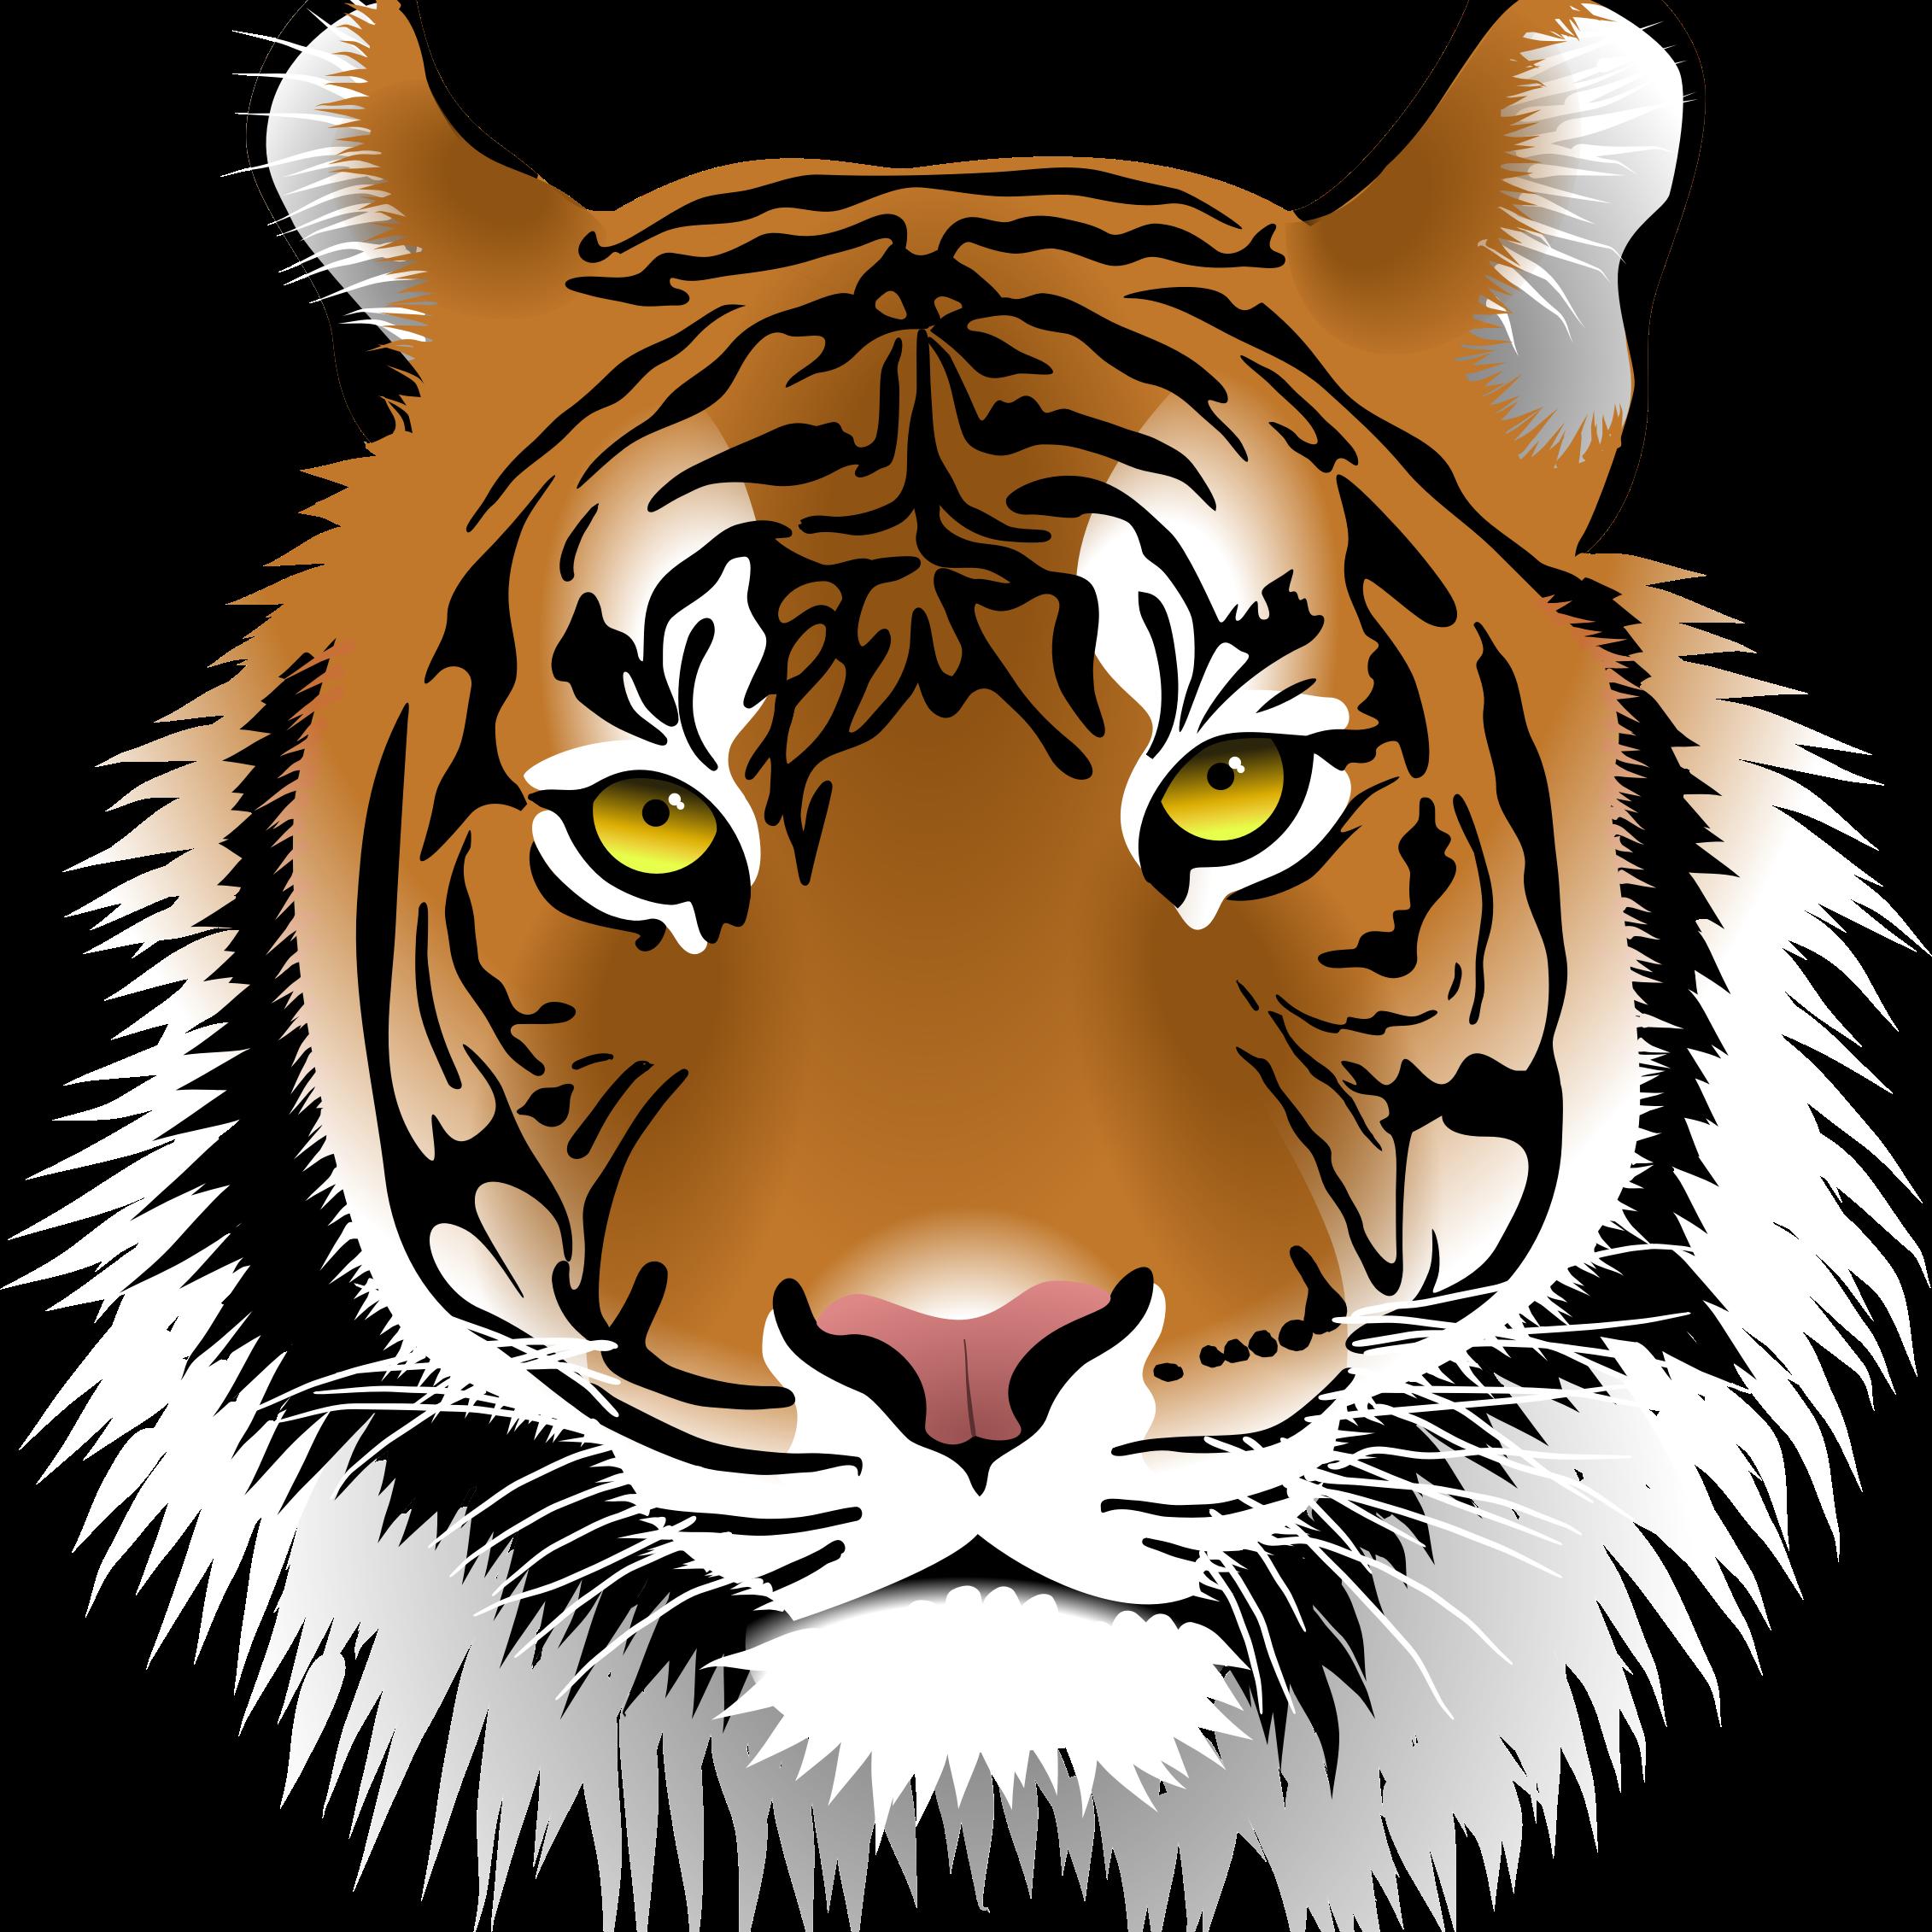 Dschungel-Tiger-Radio.de